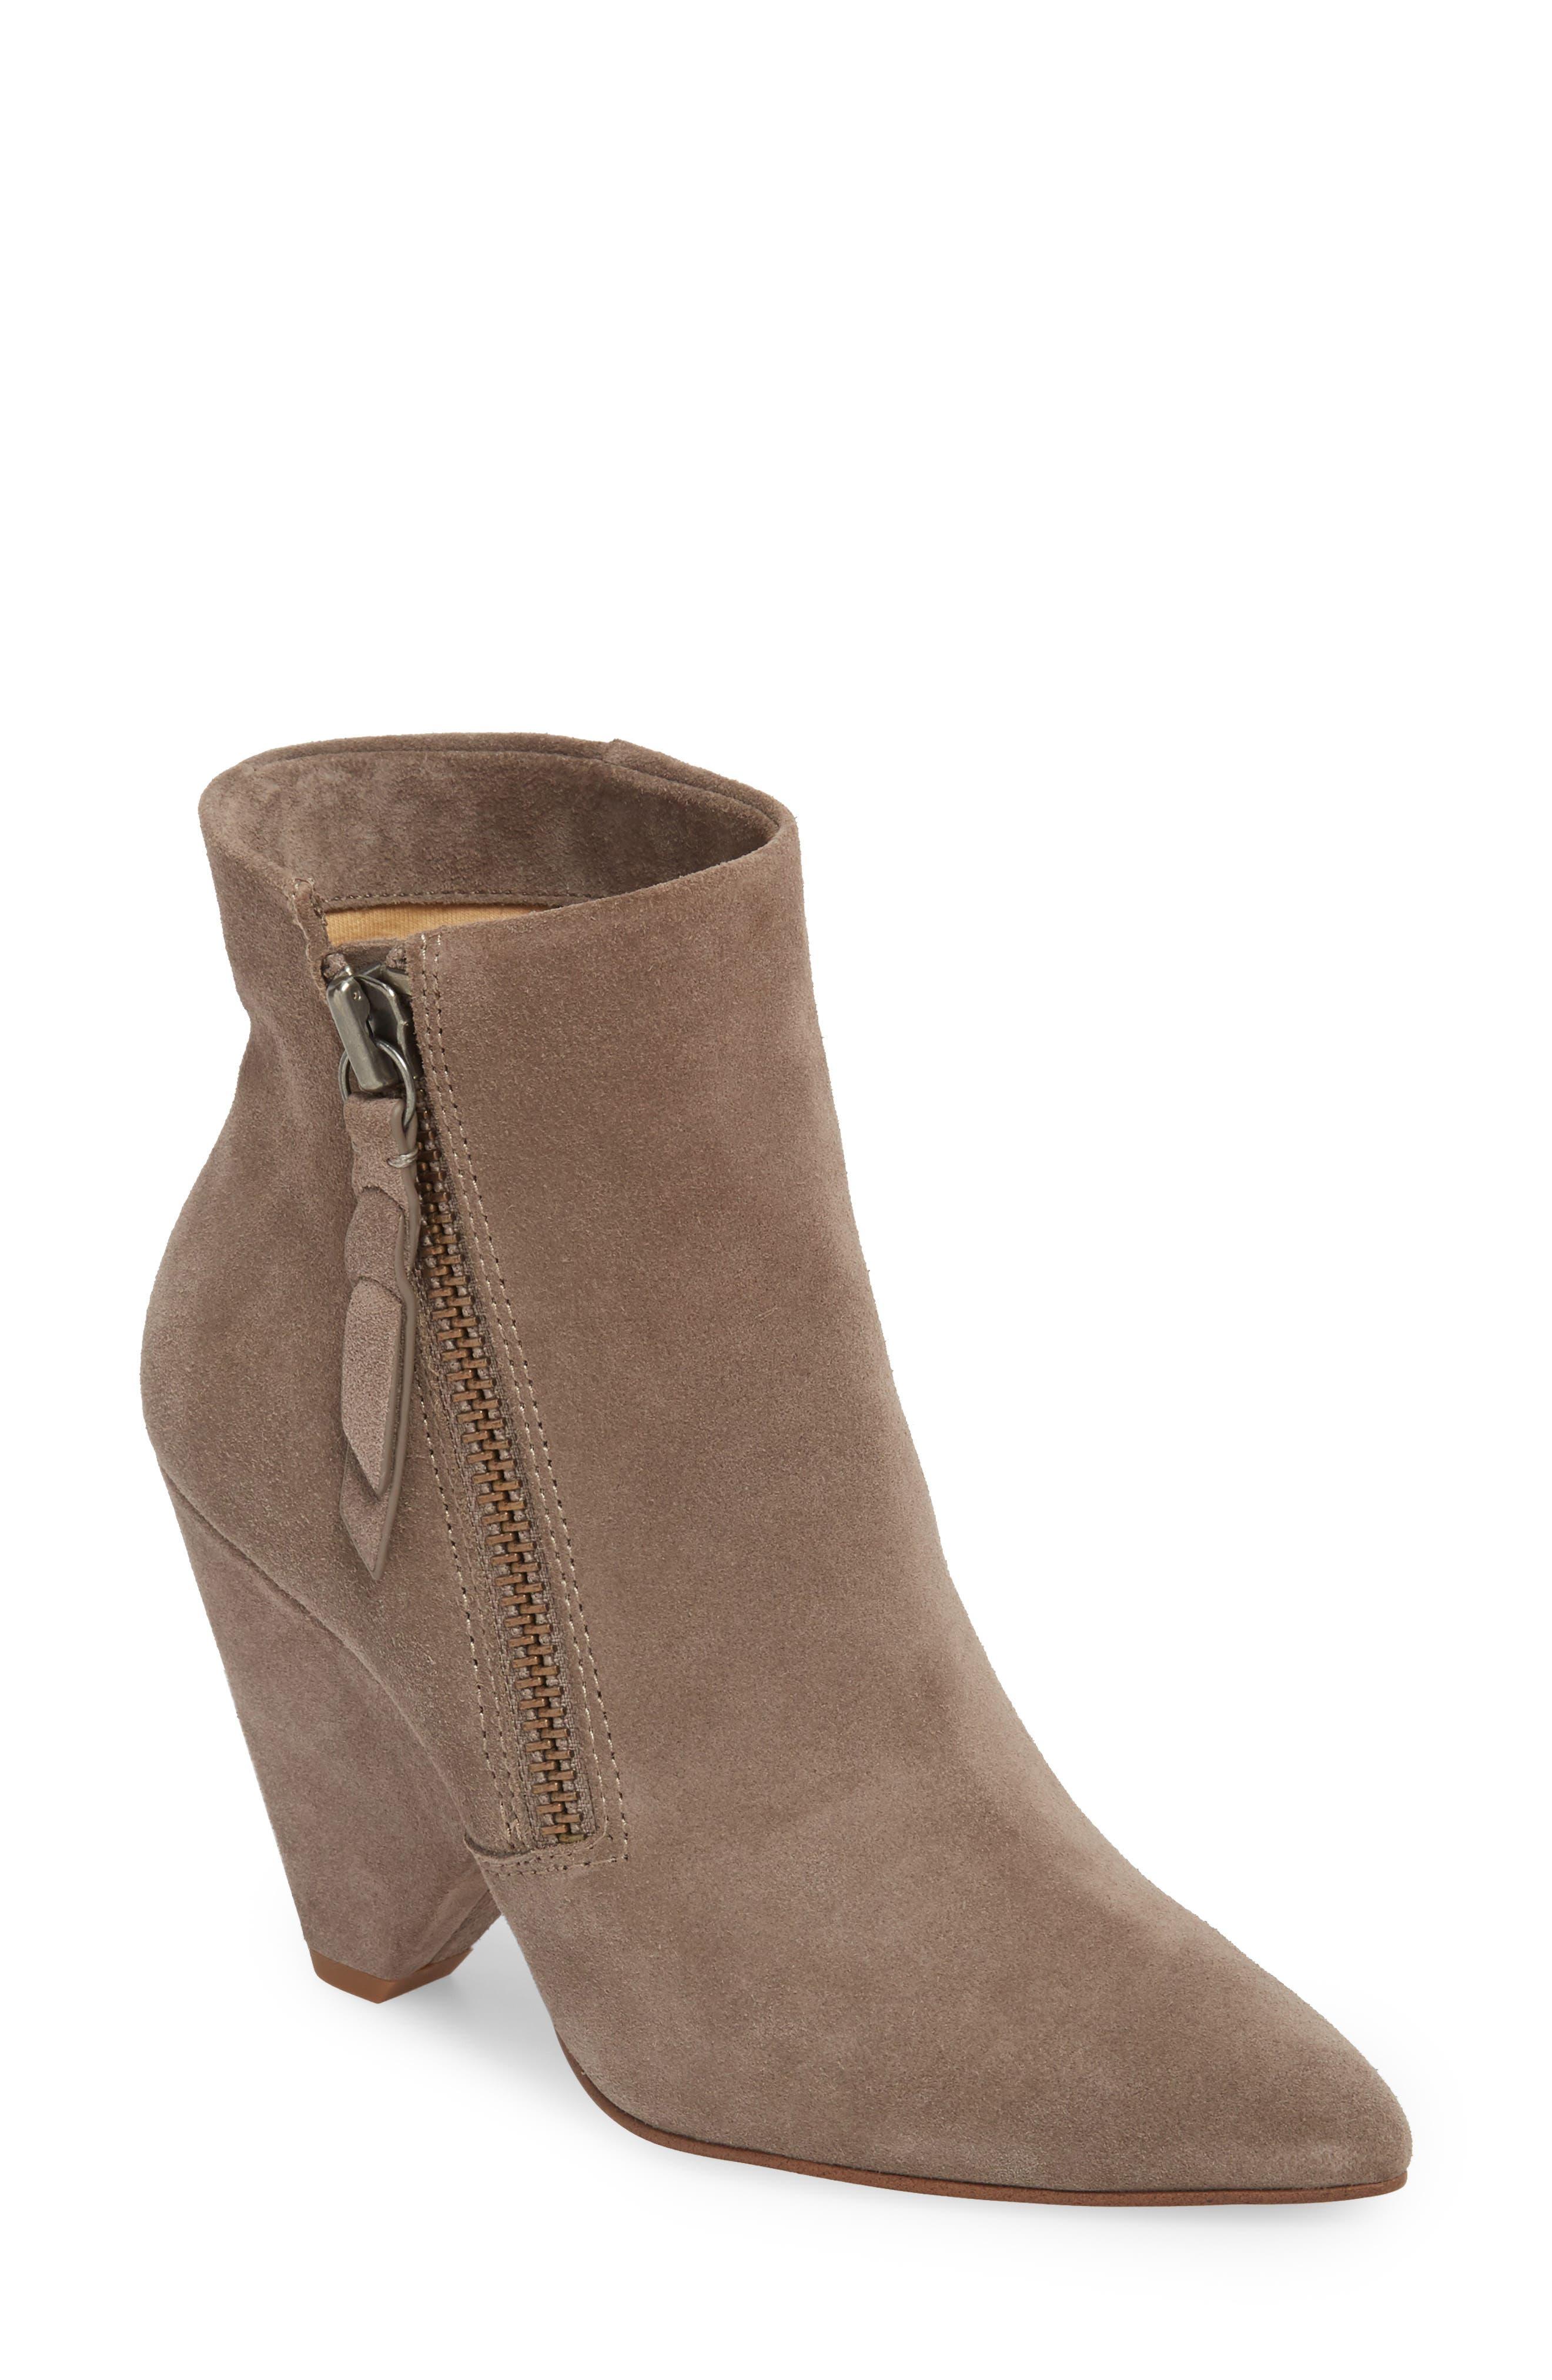 Neva Cone Heel Bootie,                         Main,                         color, Light Charcoal Suede